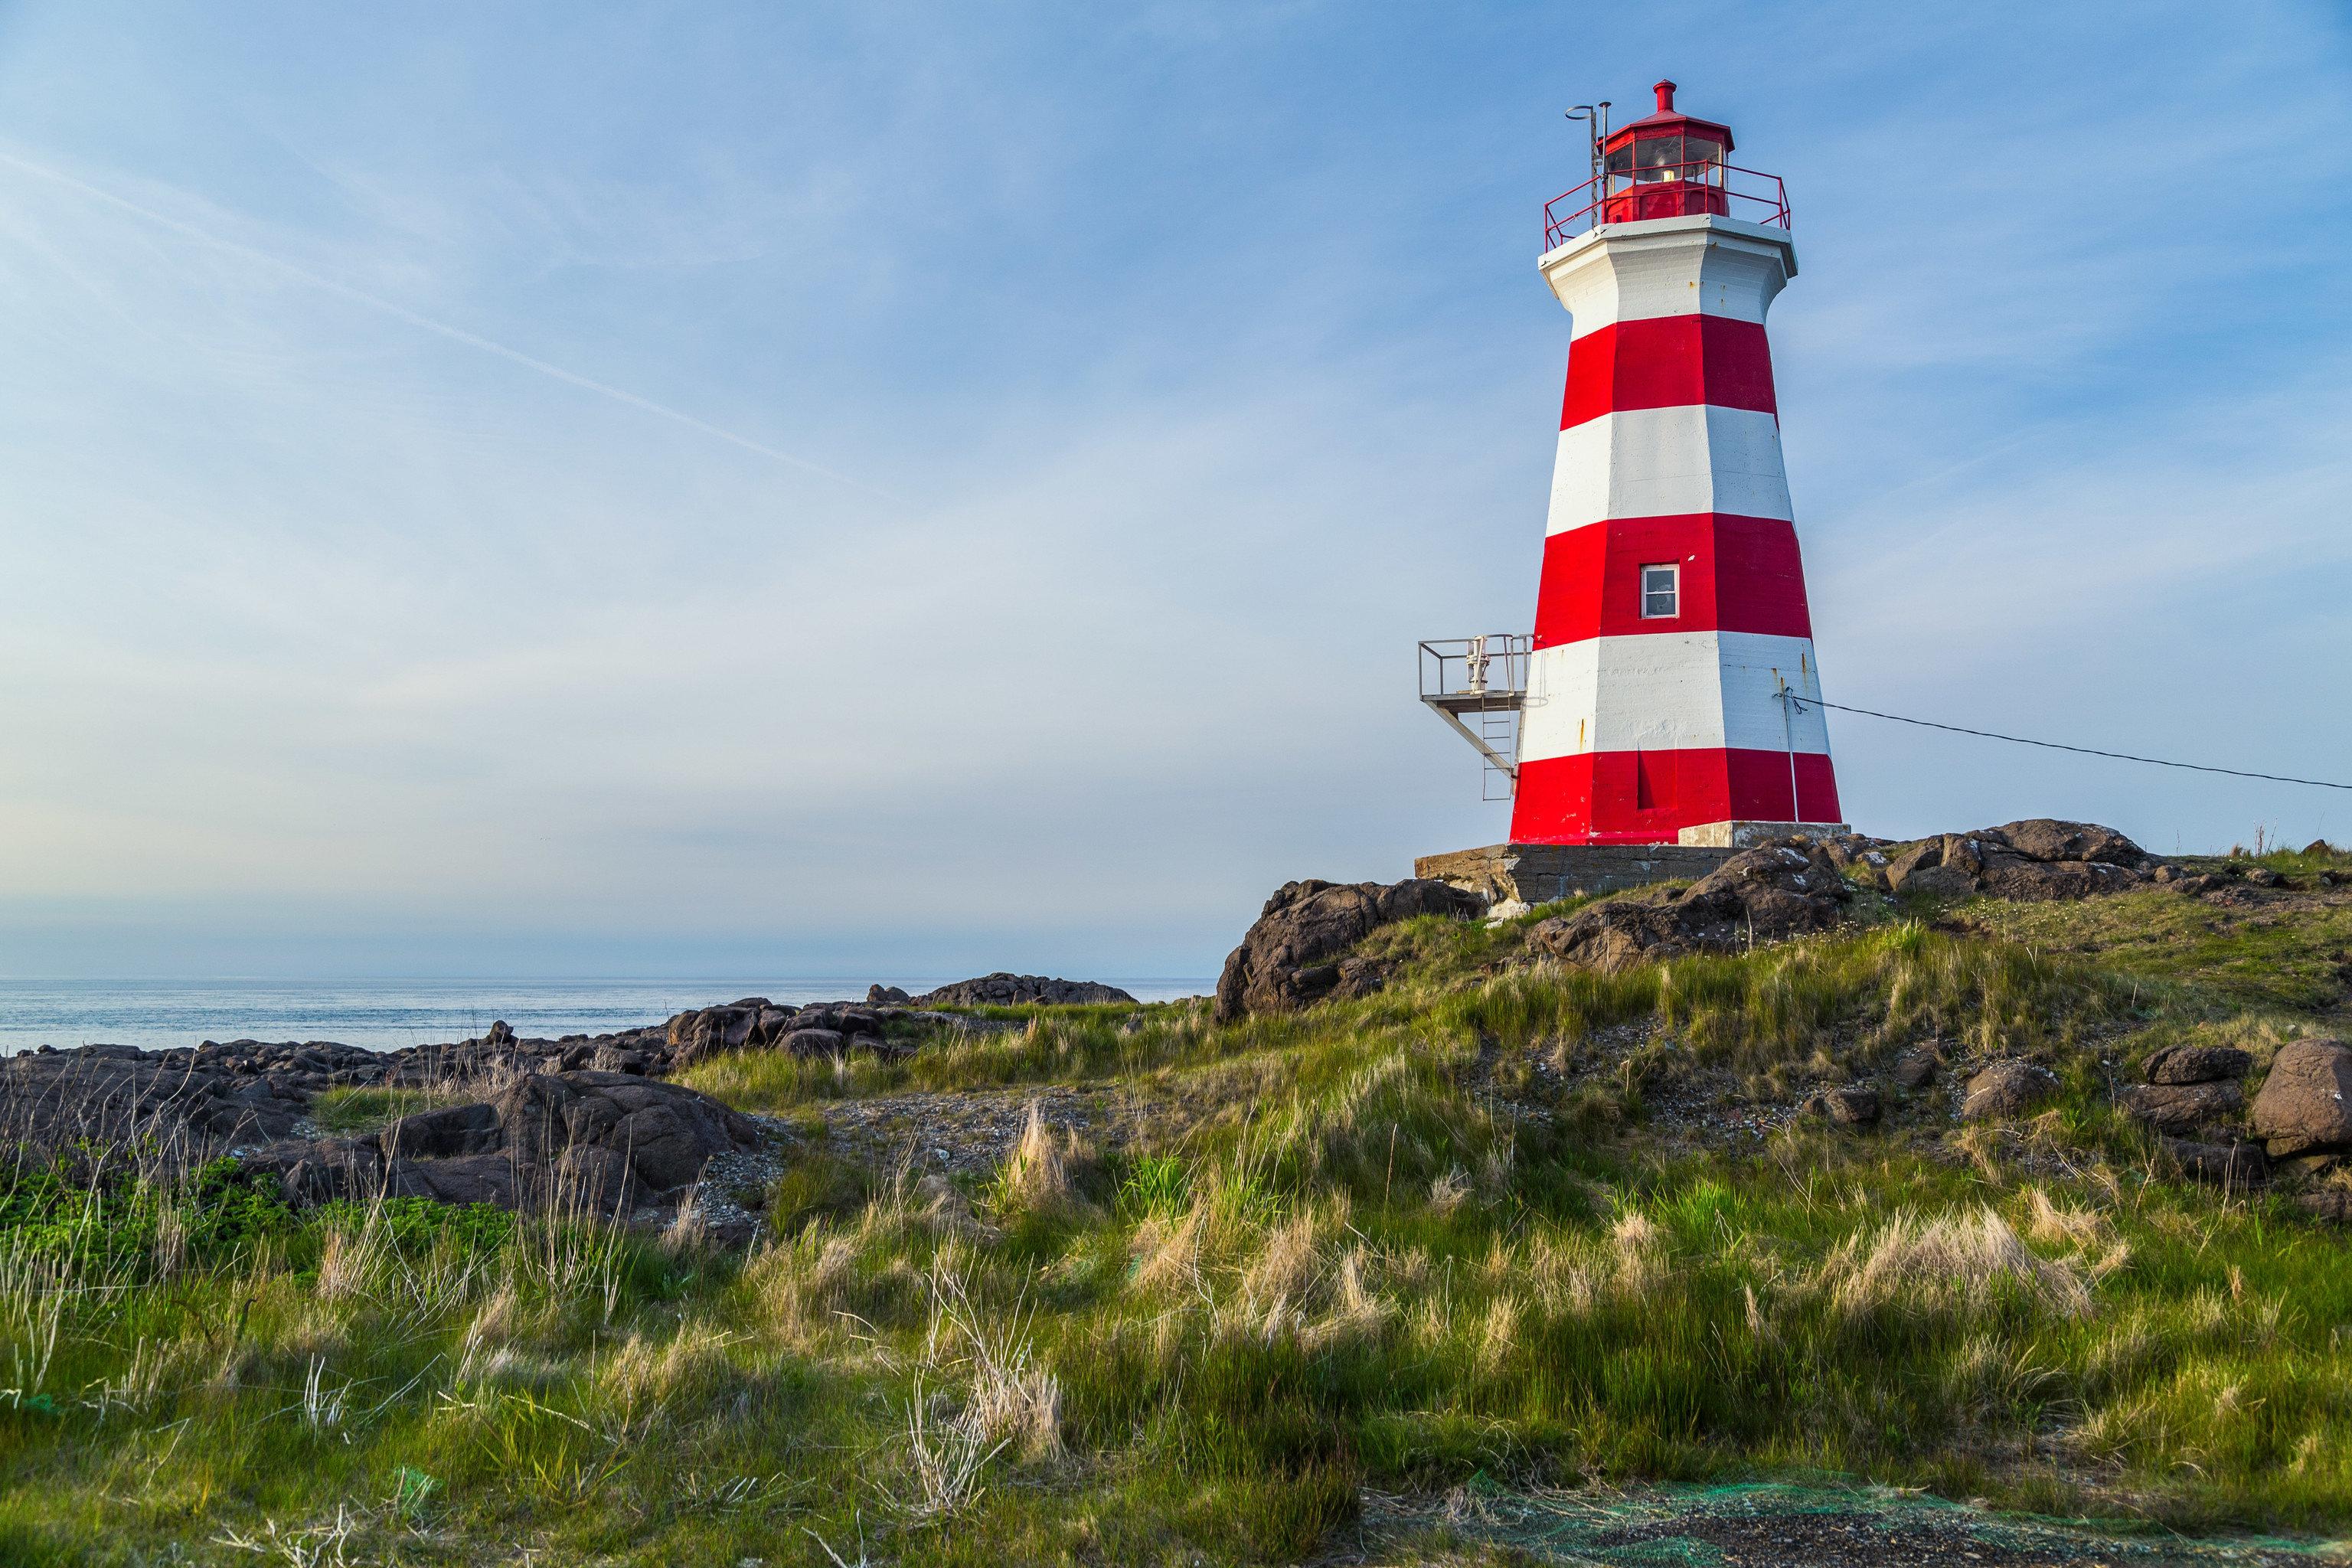 Trip Ideas grass sky outdoor lighthouse tower Coast Sea hill Ocean green grassy cape cove hillside lush